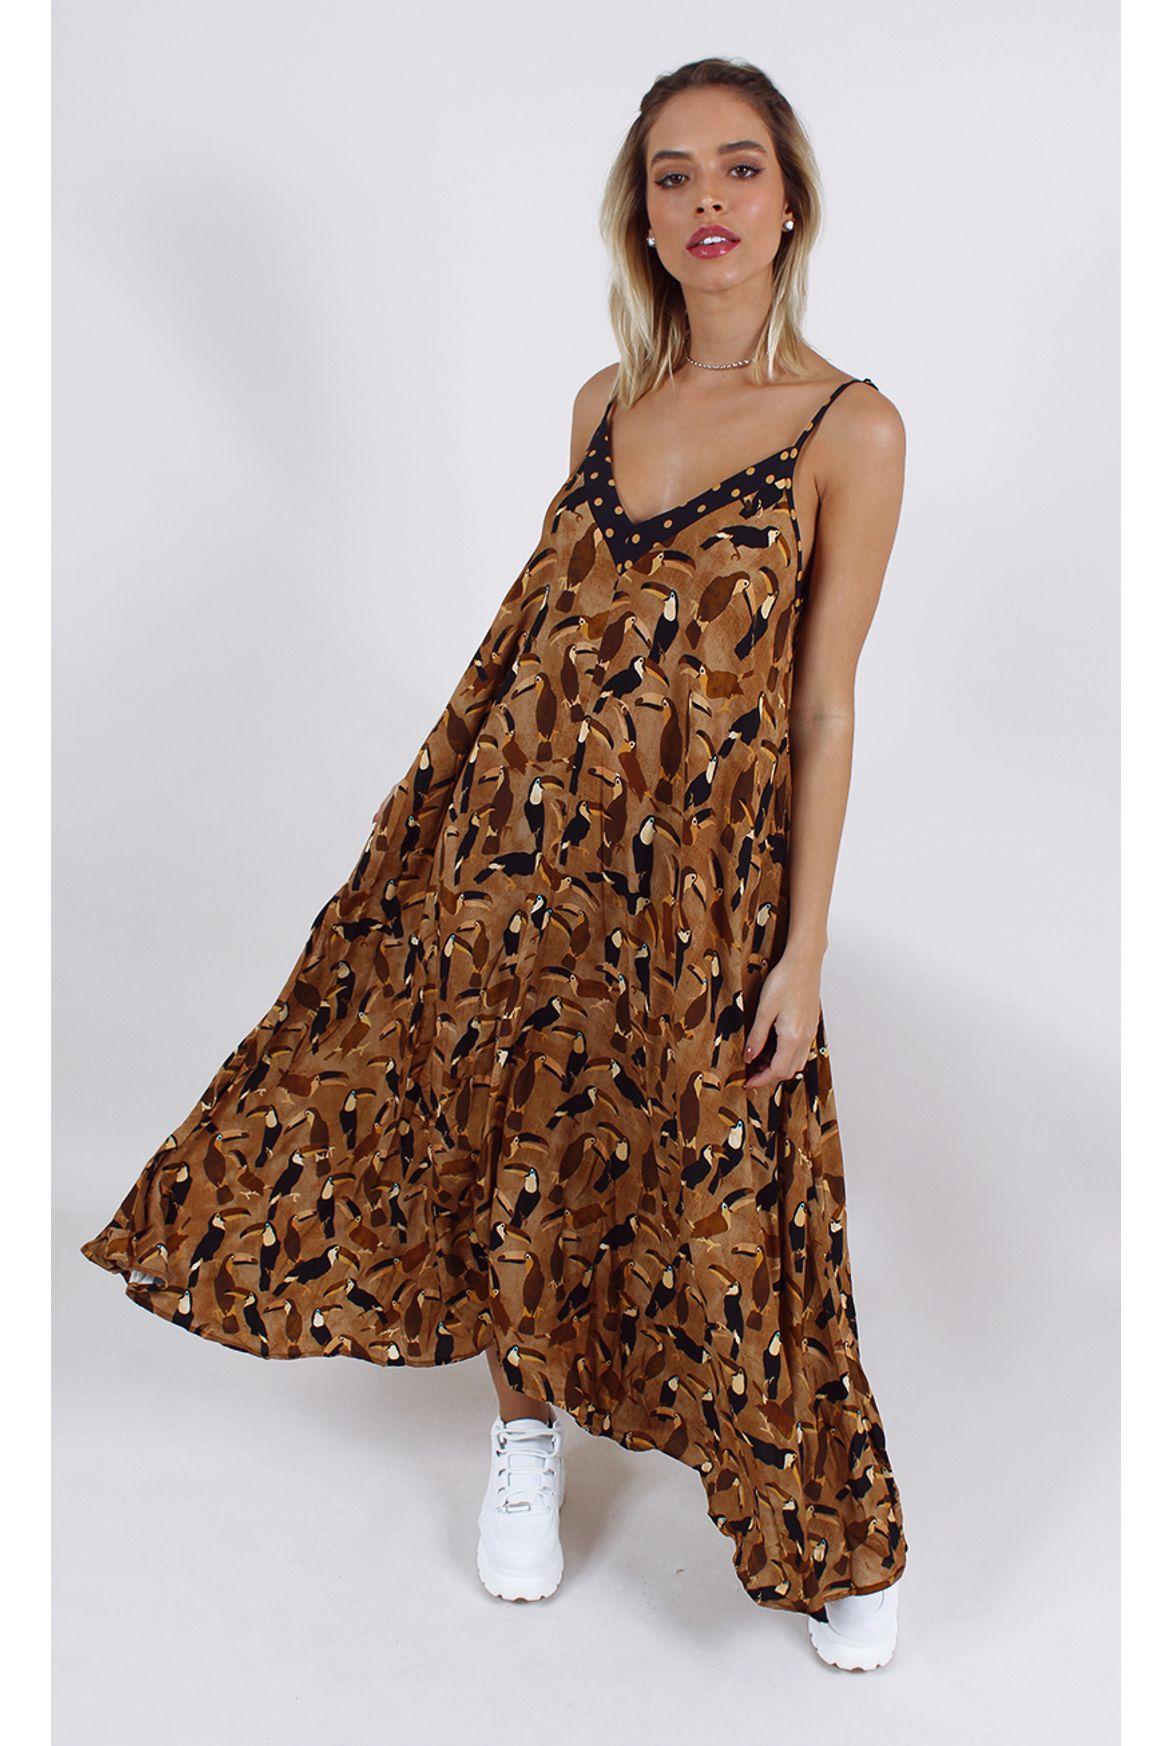 f7cfae1edee46 FSHN - macacão farm tucano marrom - Fashion Closet